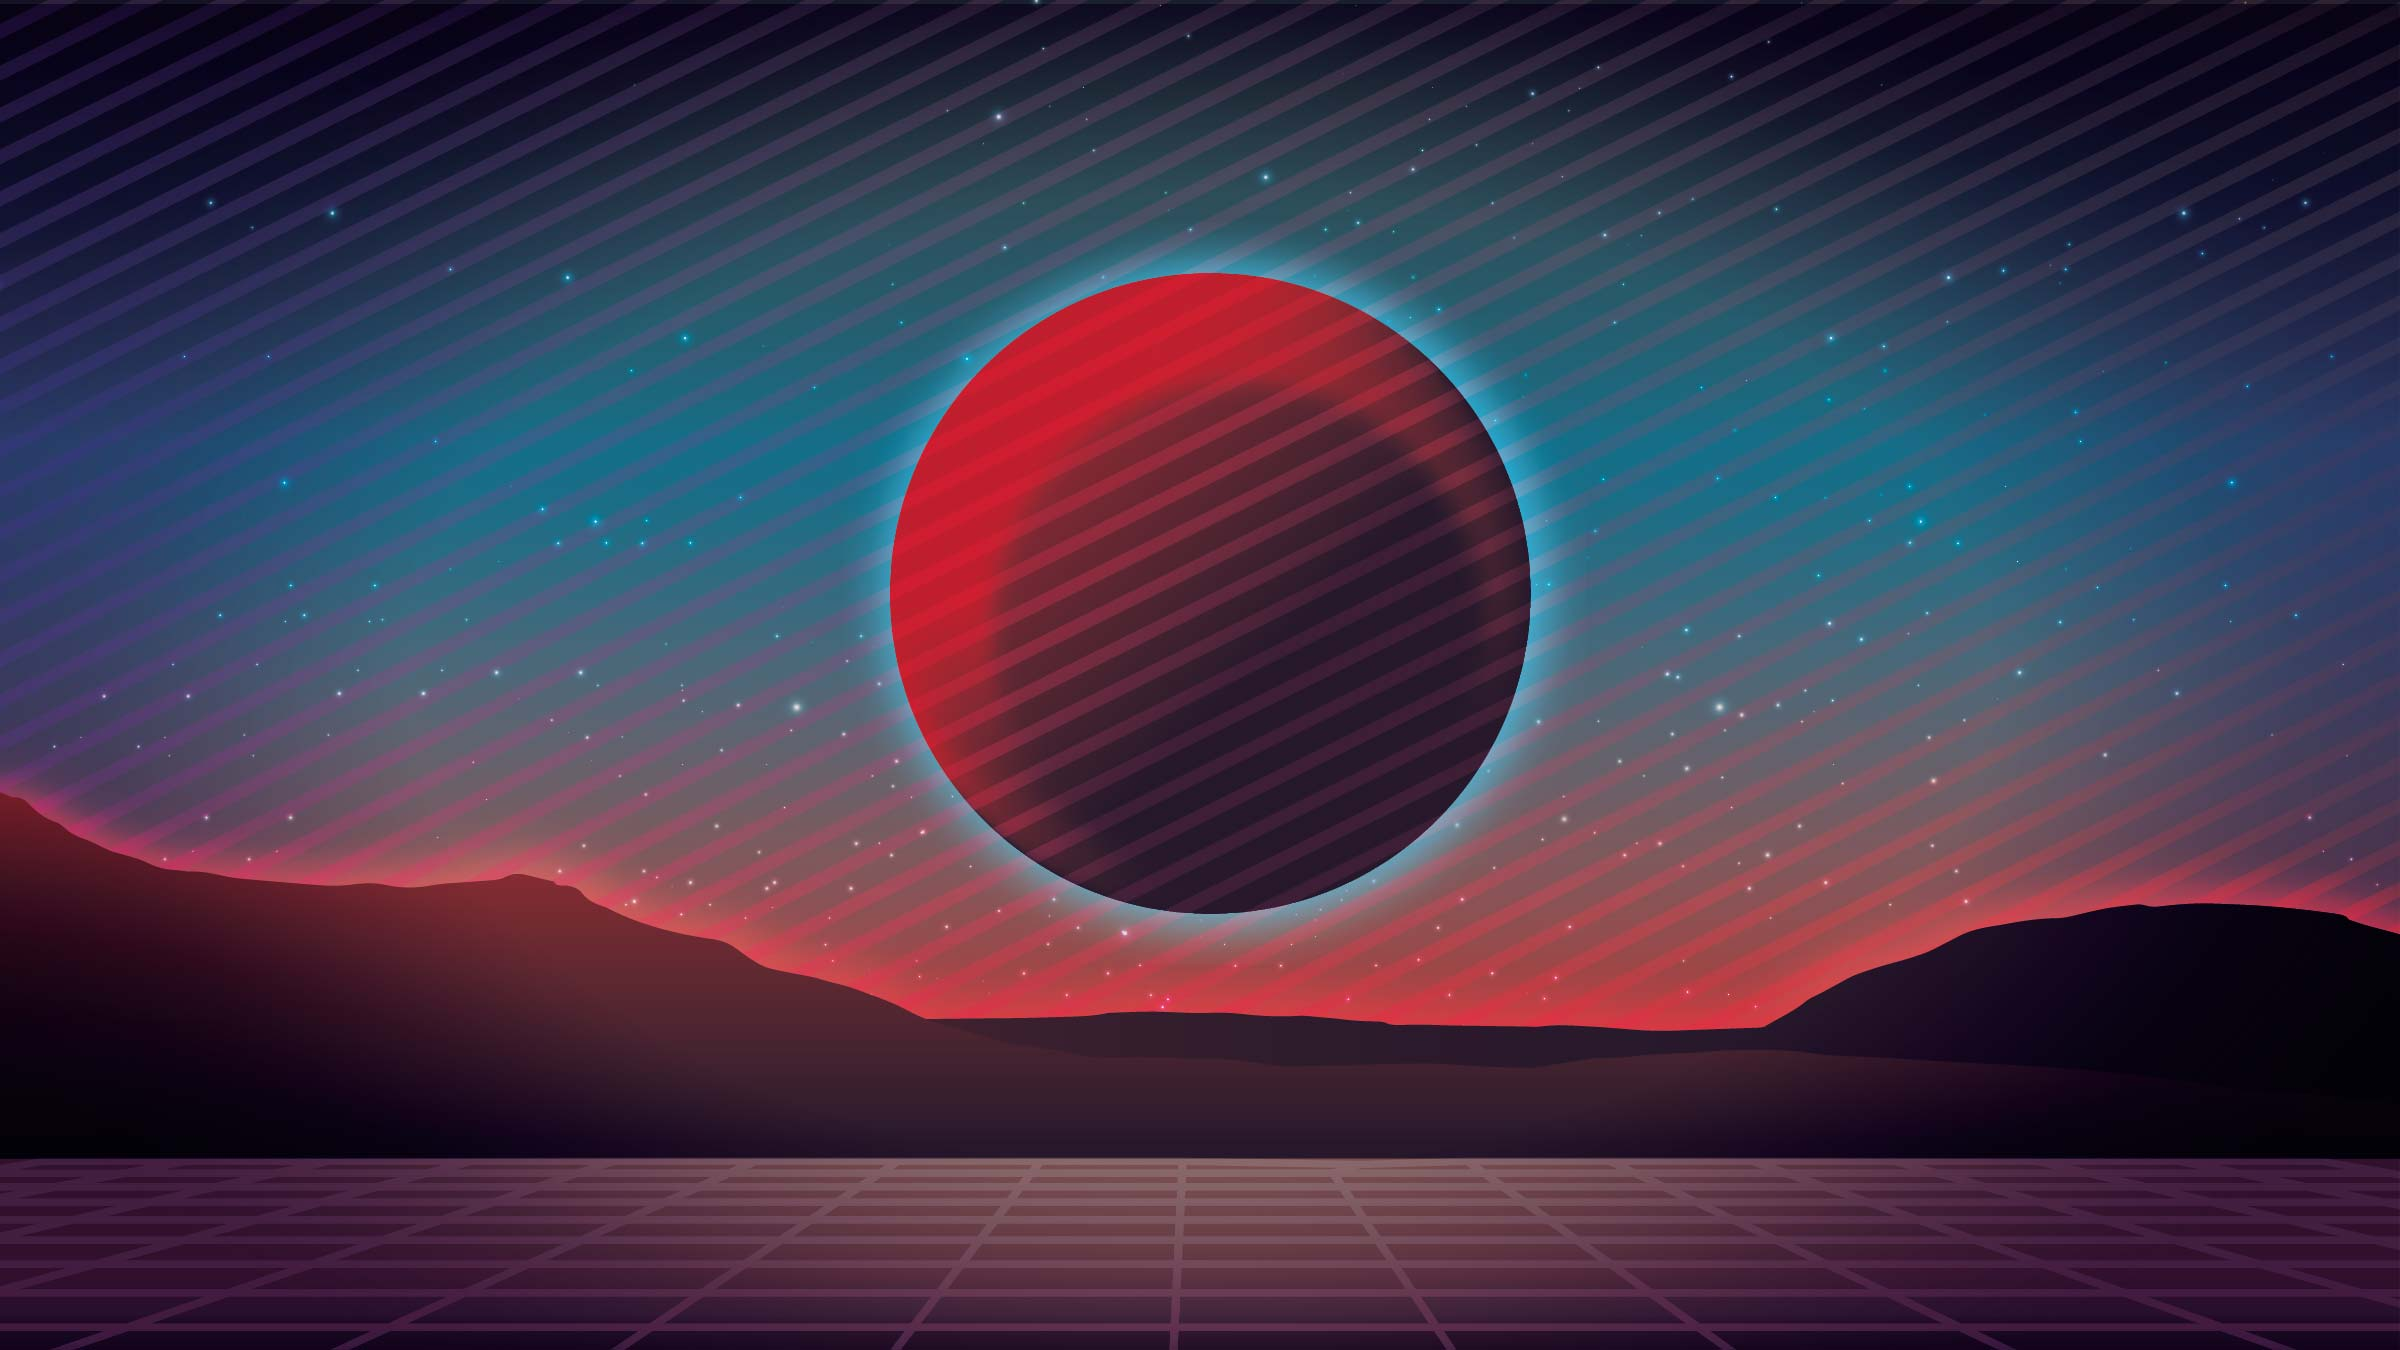 retro game background